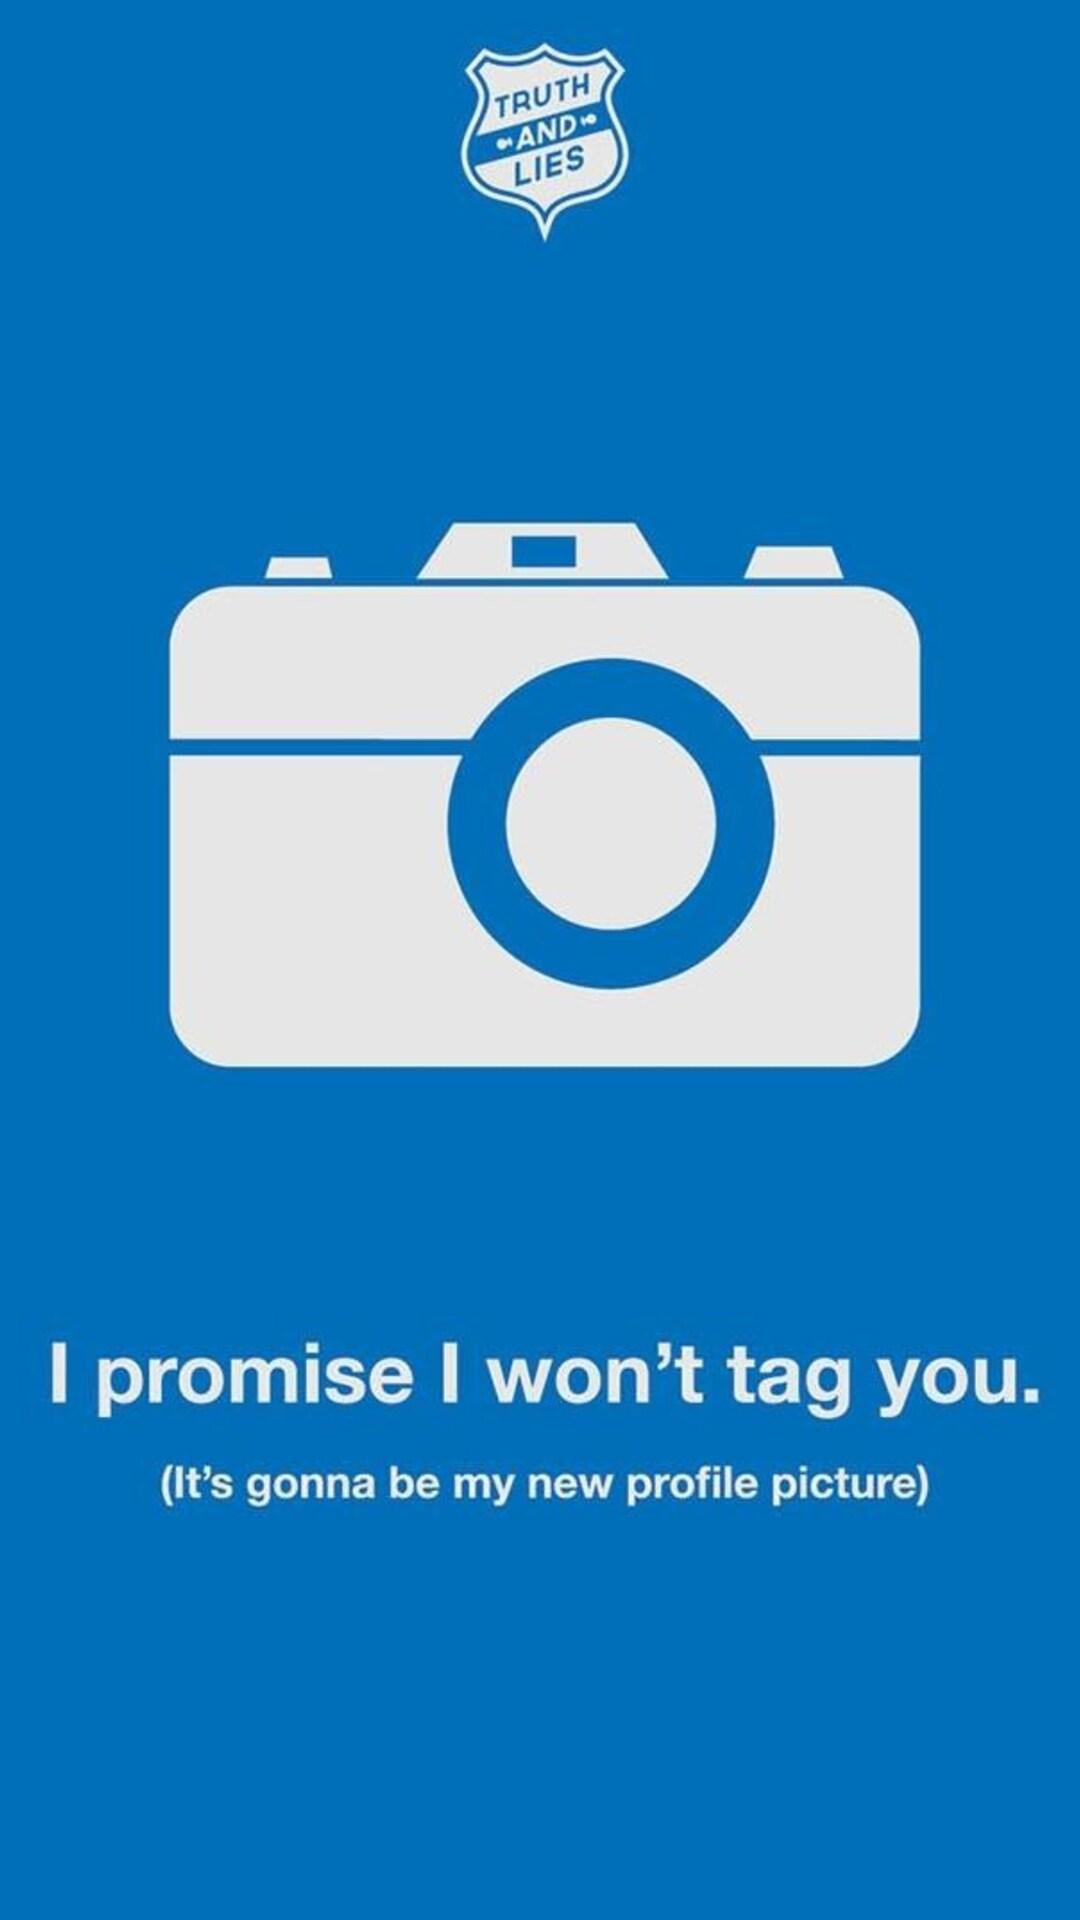 i-promise-i-wont-tag-you-qhd.jpg